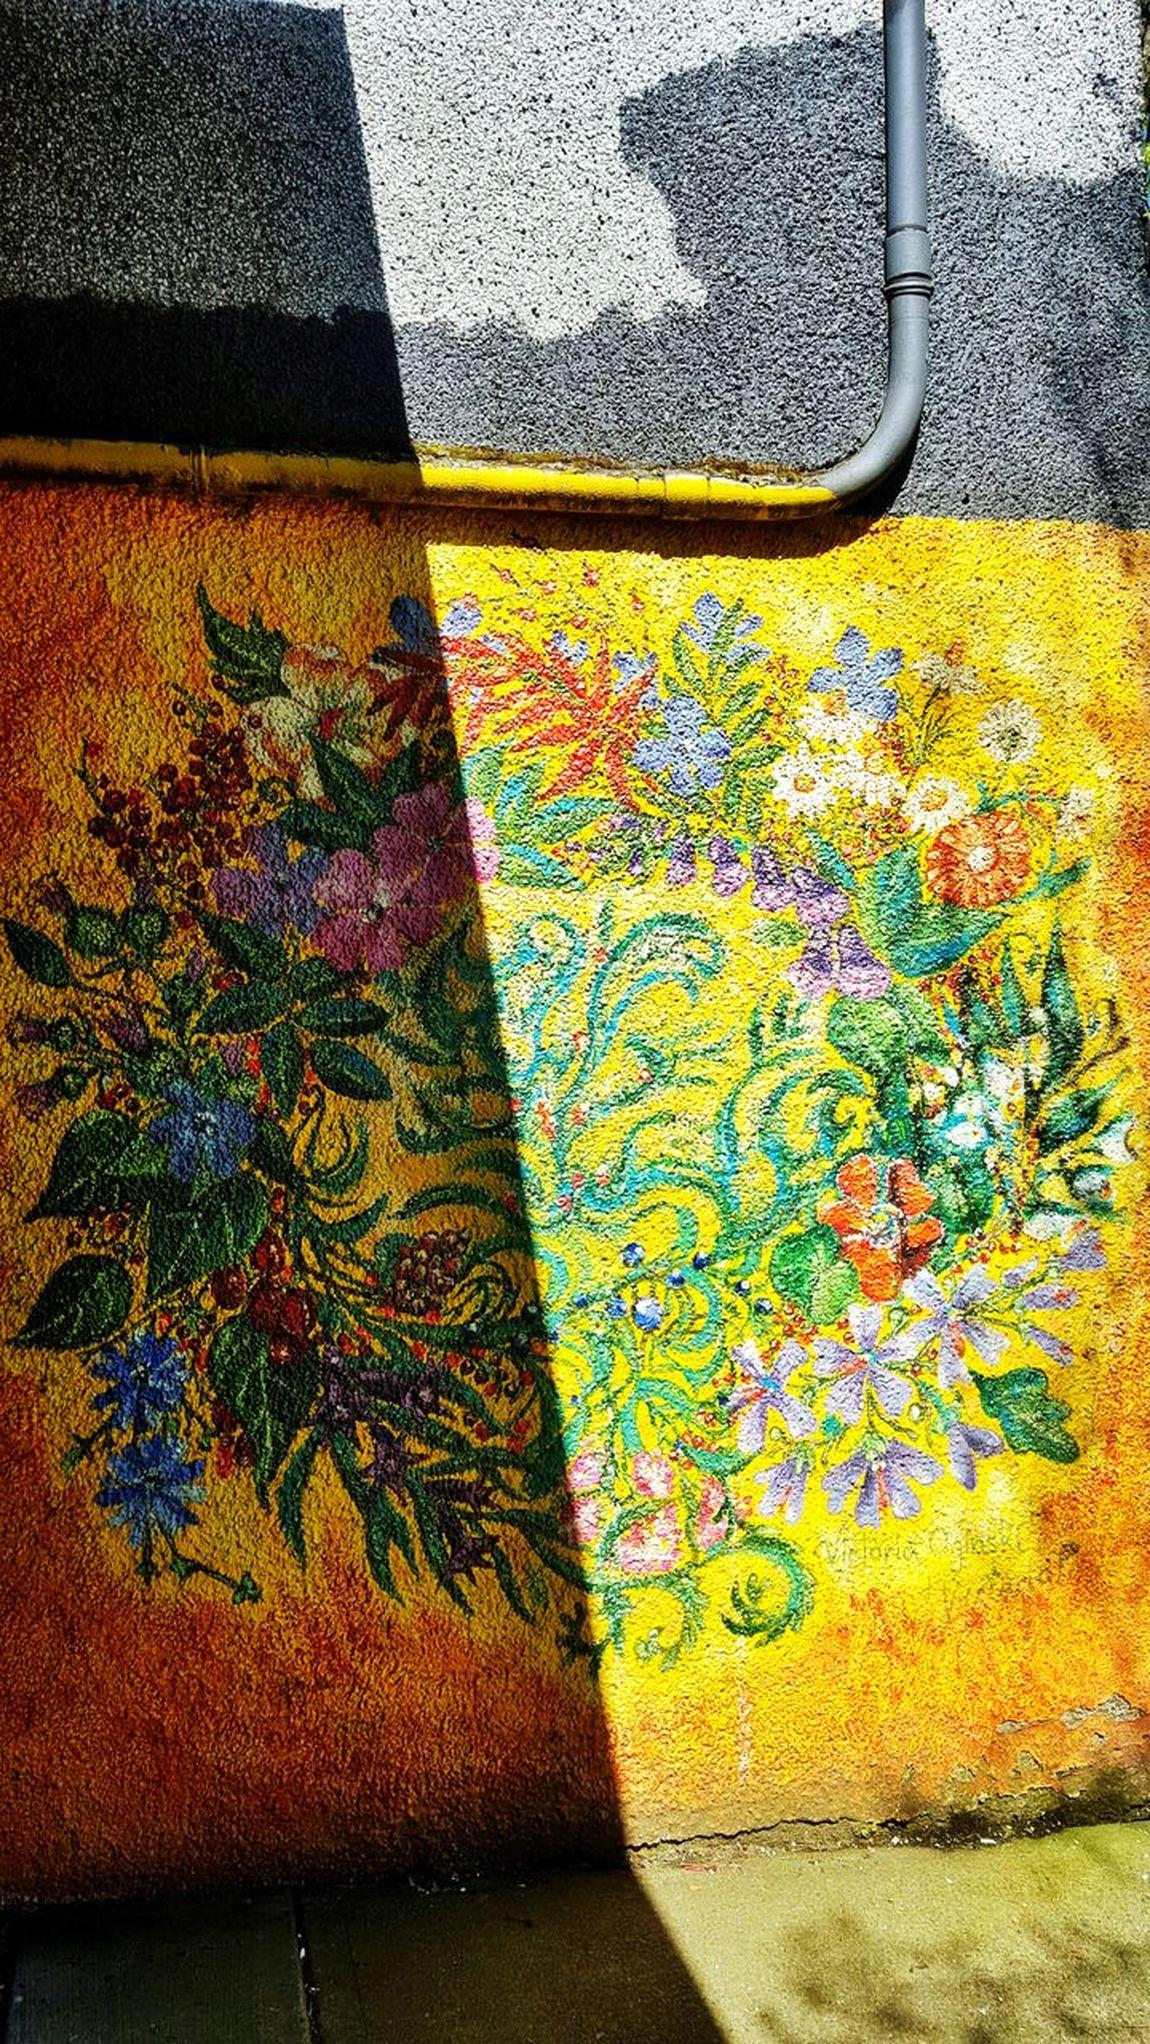 Sunlight Street Art Graffiti Textured  Multi Colored No People Day Pattern Close-up Light And Dark Into The Light Art Is Everywhere Sunshine Light Dark Murel Vancouver East Van East Vancouver British Columbia, Canada The Street Photographer - 2017 EyeEm Awards